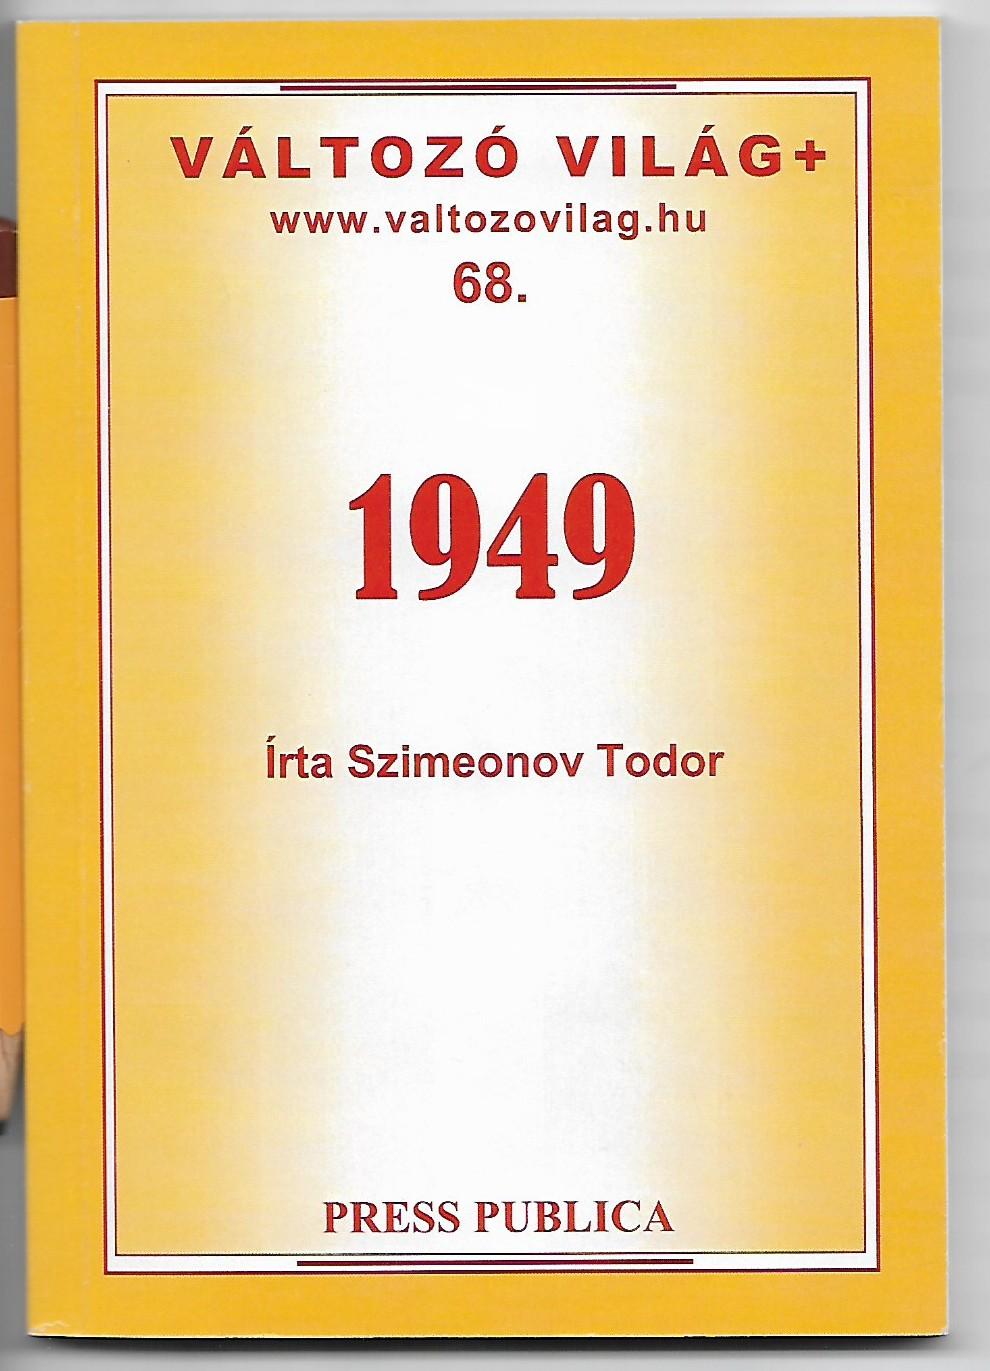 1949 krónikája